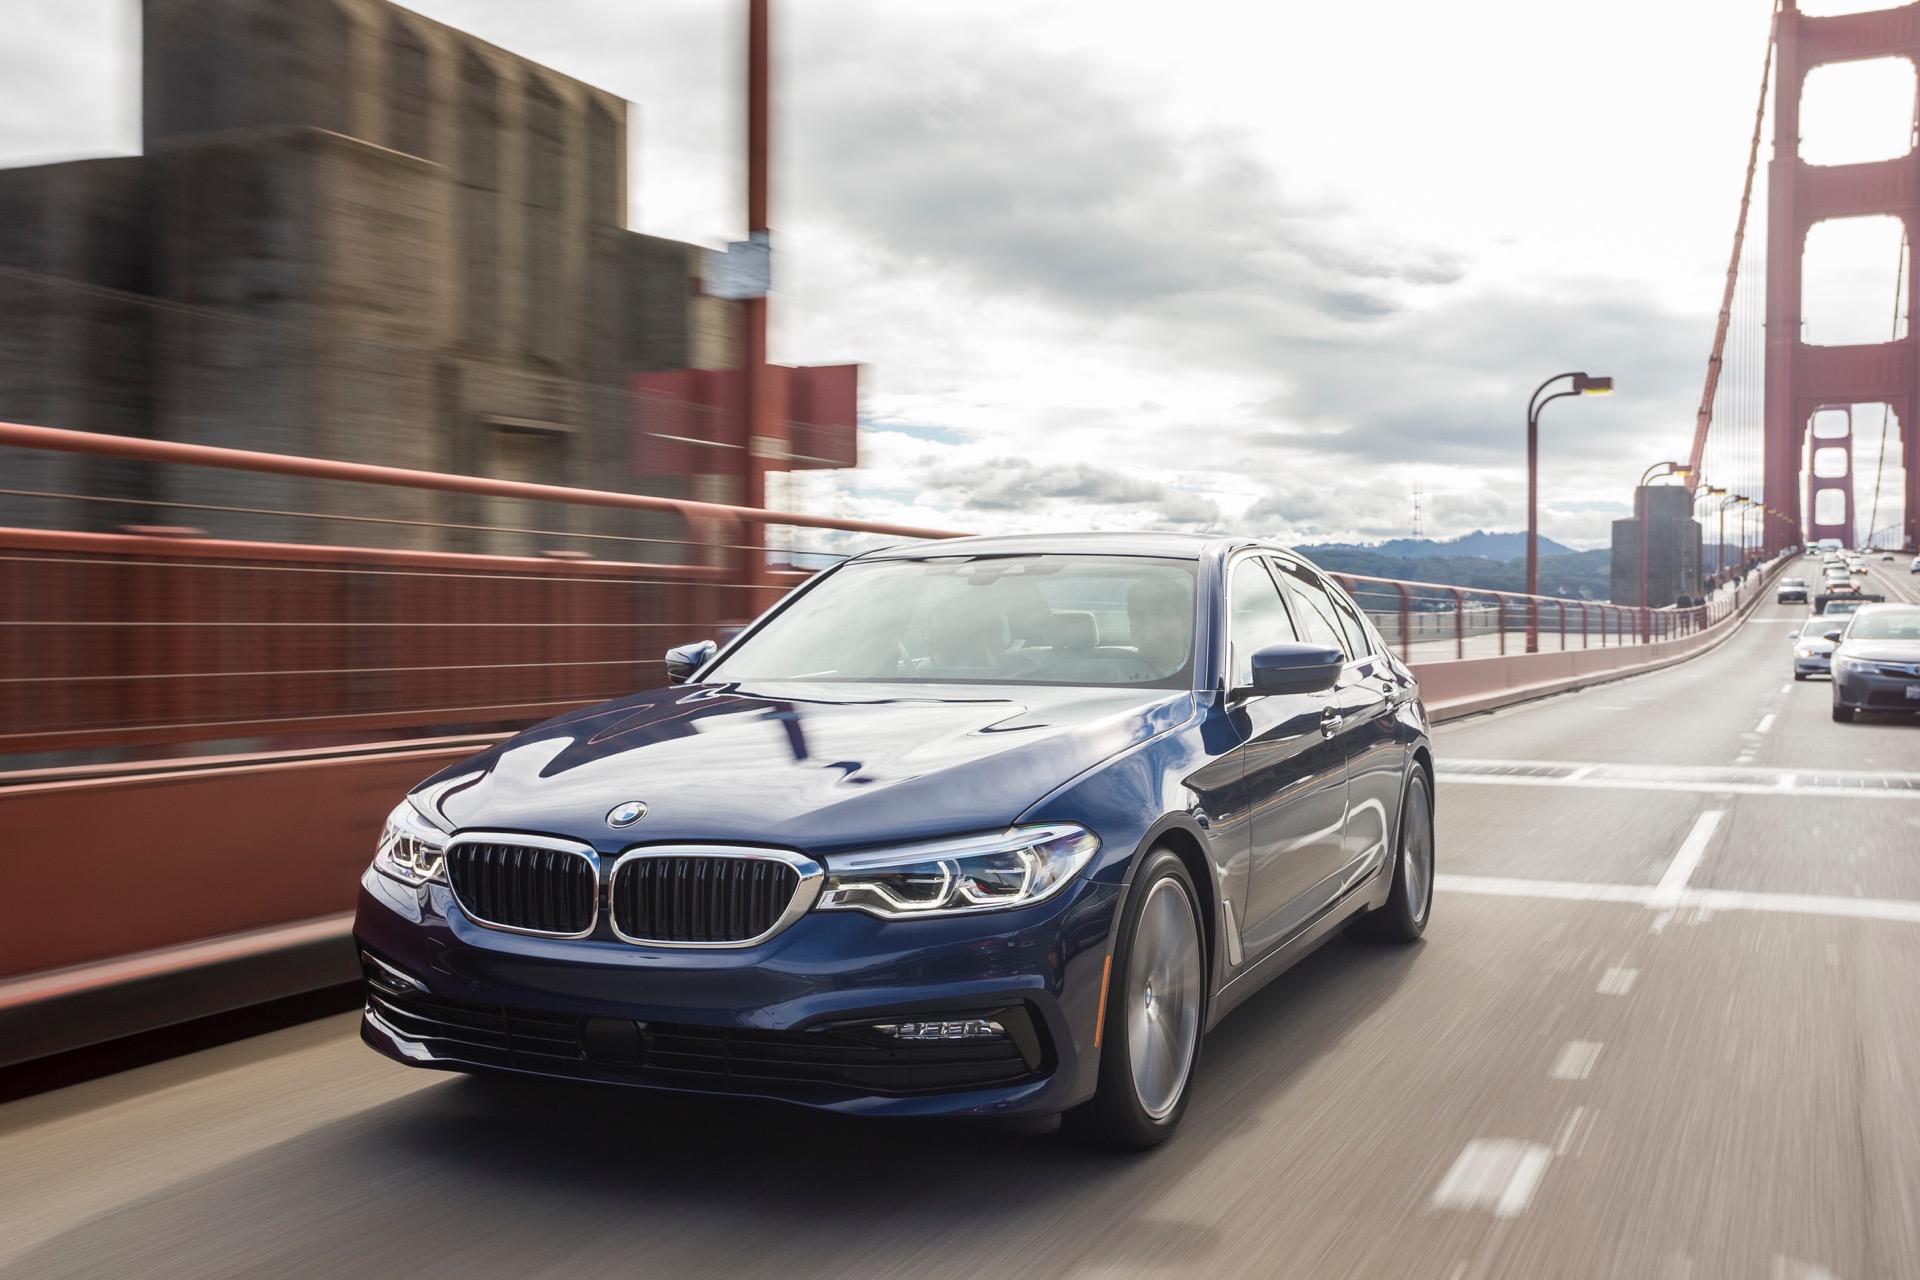 2017 BMW 5 Series G305